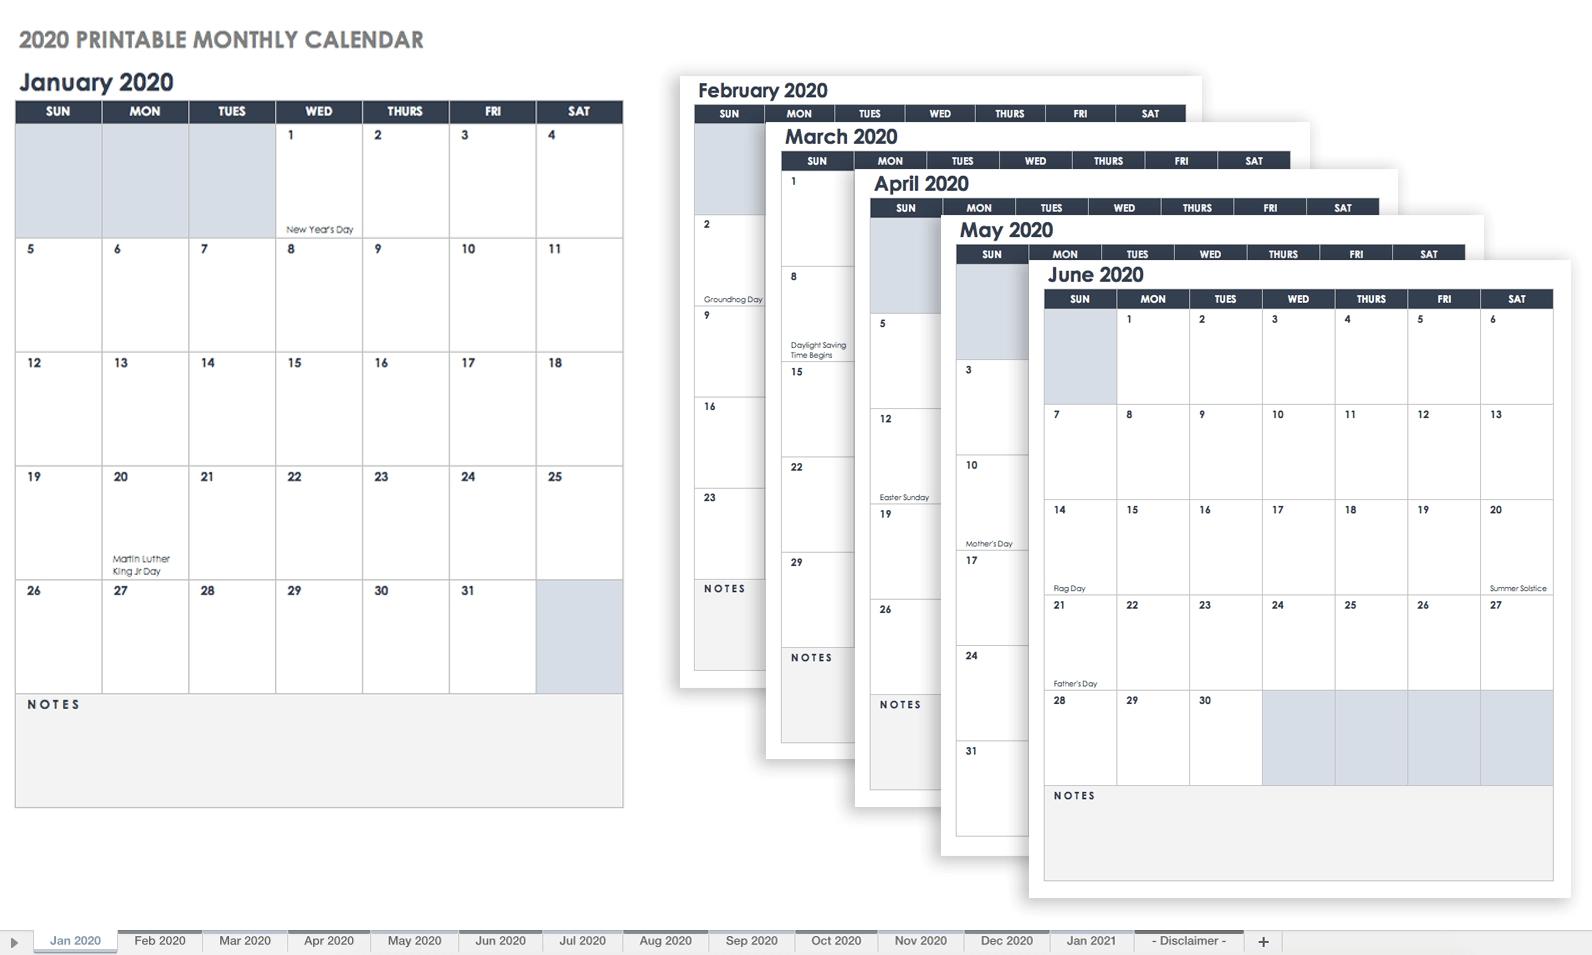 Free Blank Calendar Templates - Smartsheet intended for 12 Month Blank Calendar Template